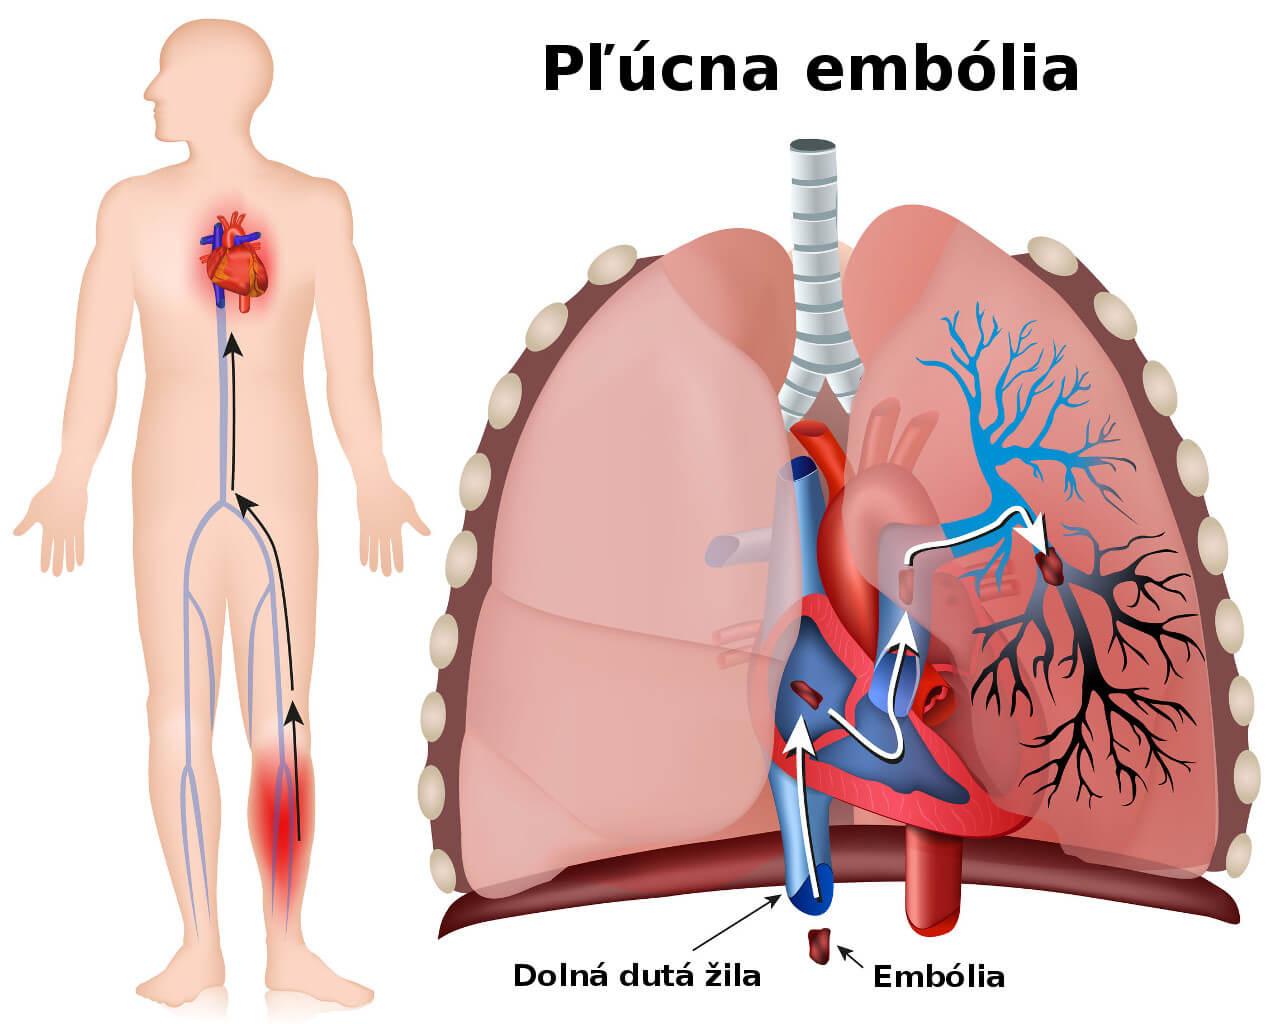 Pľúcna embólia, hlboká žilová trombóza